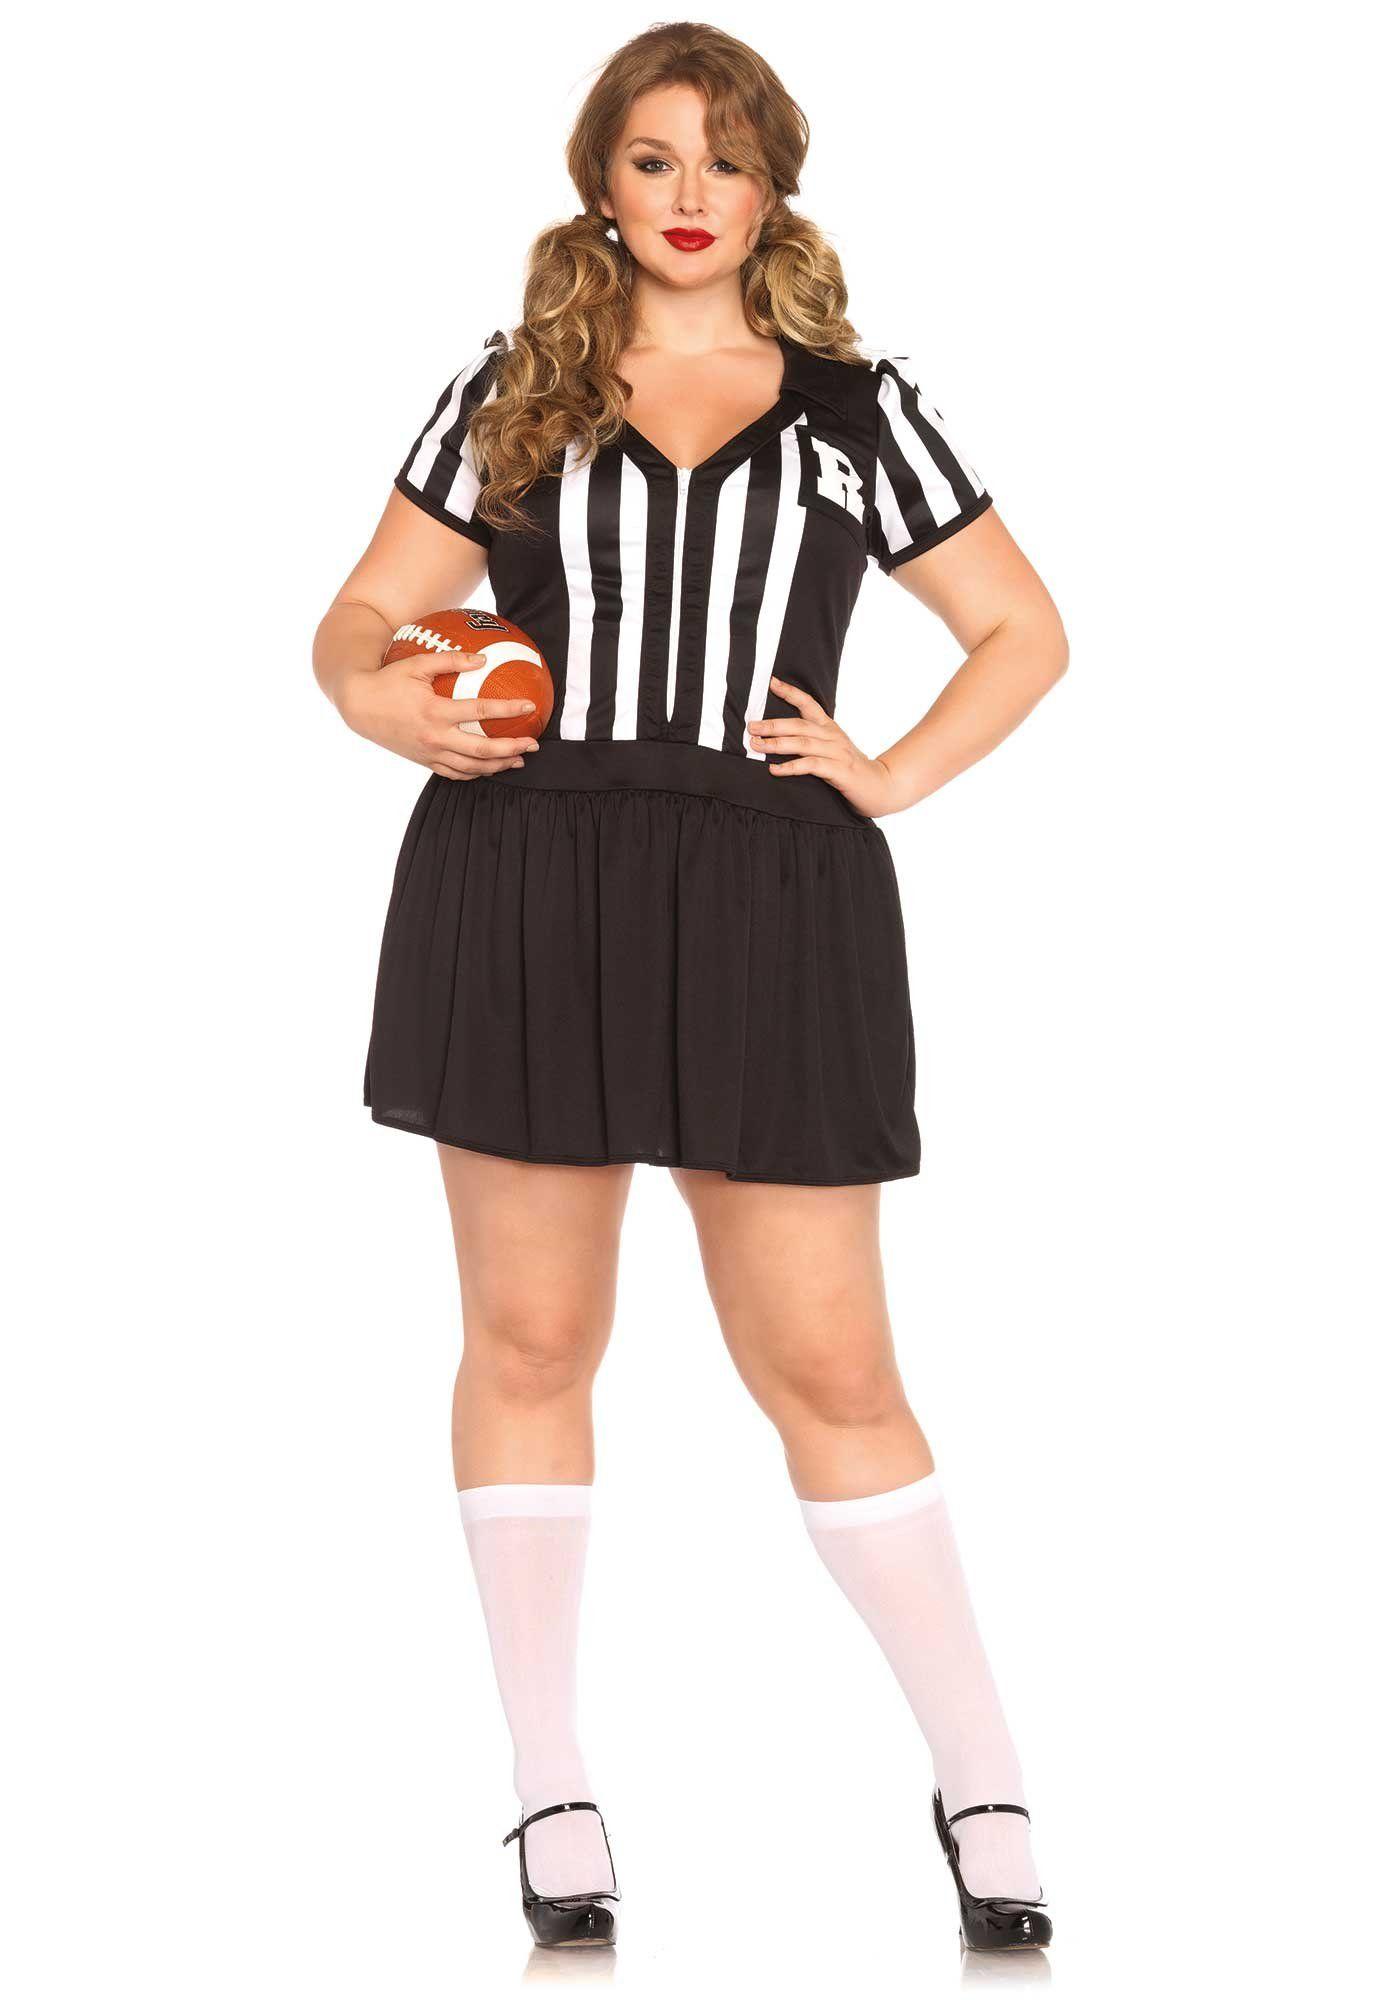 Leg Avenue Women's Plus-Size Halftime Hottie Referee Costume ...